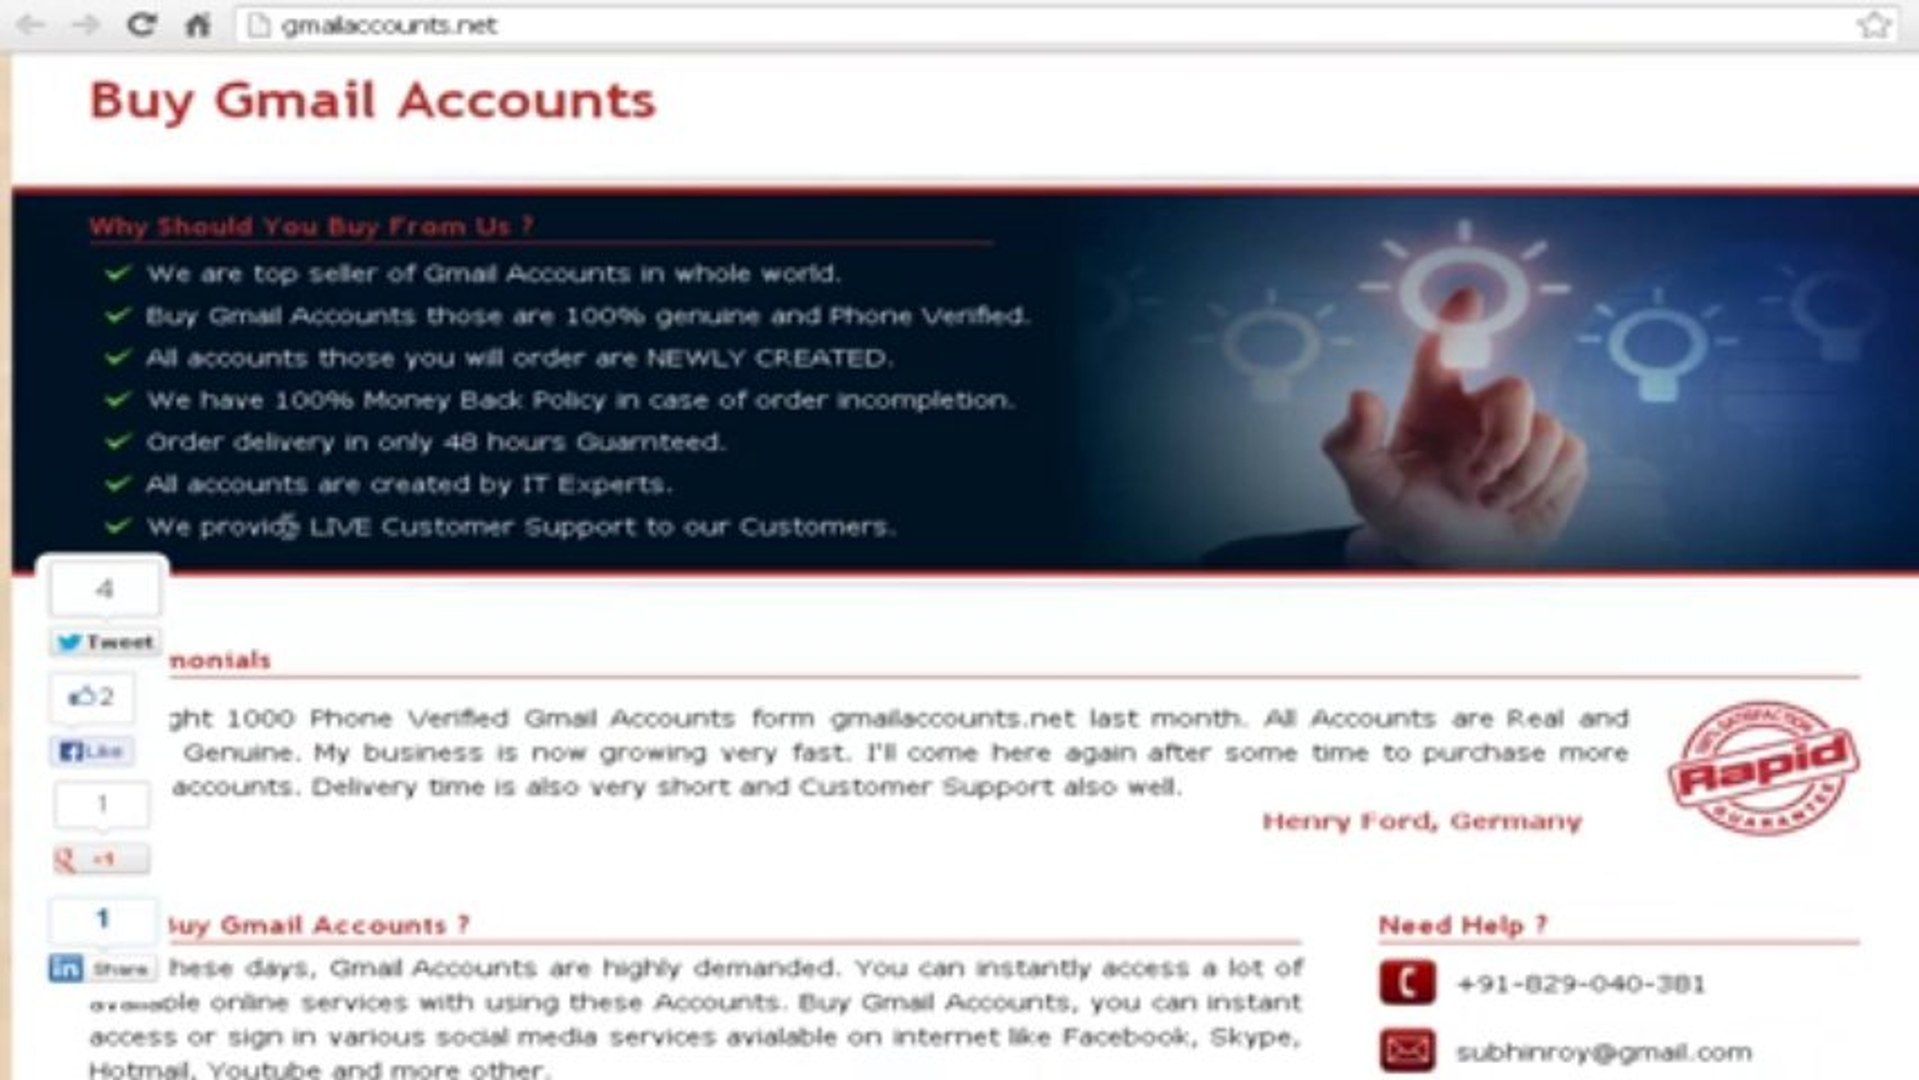 Buy Gmail Accounts & PVA gmail accounts